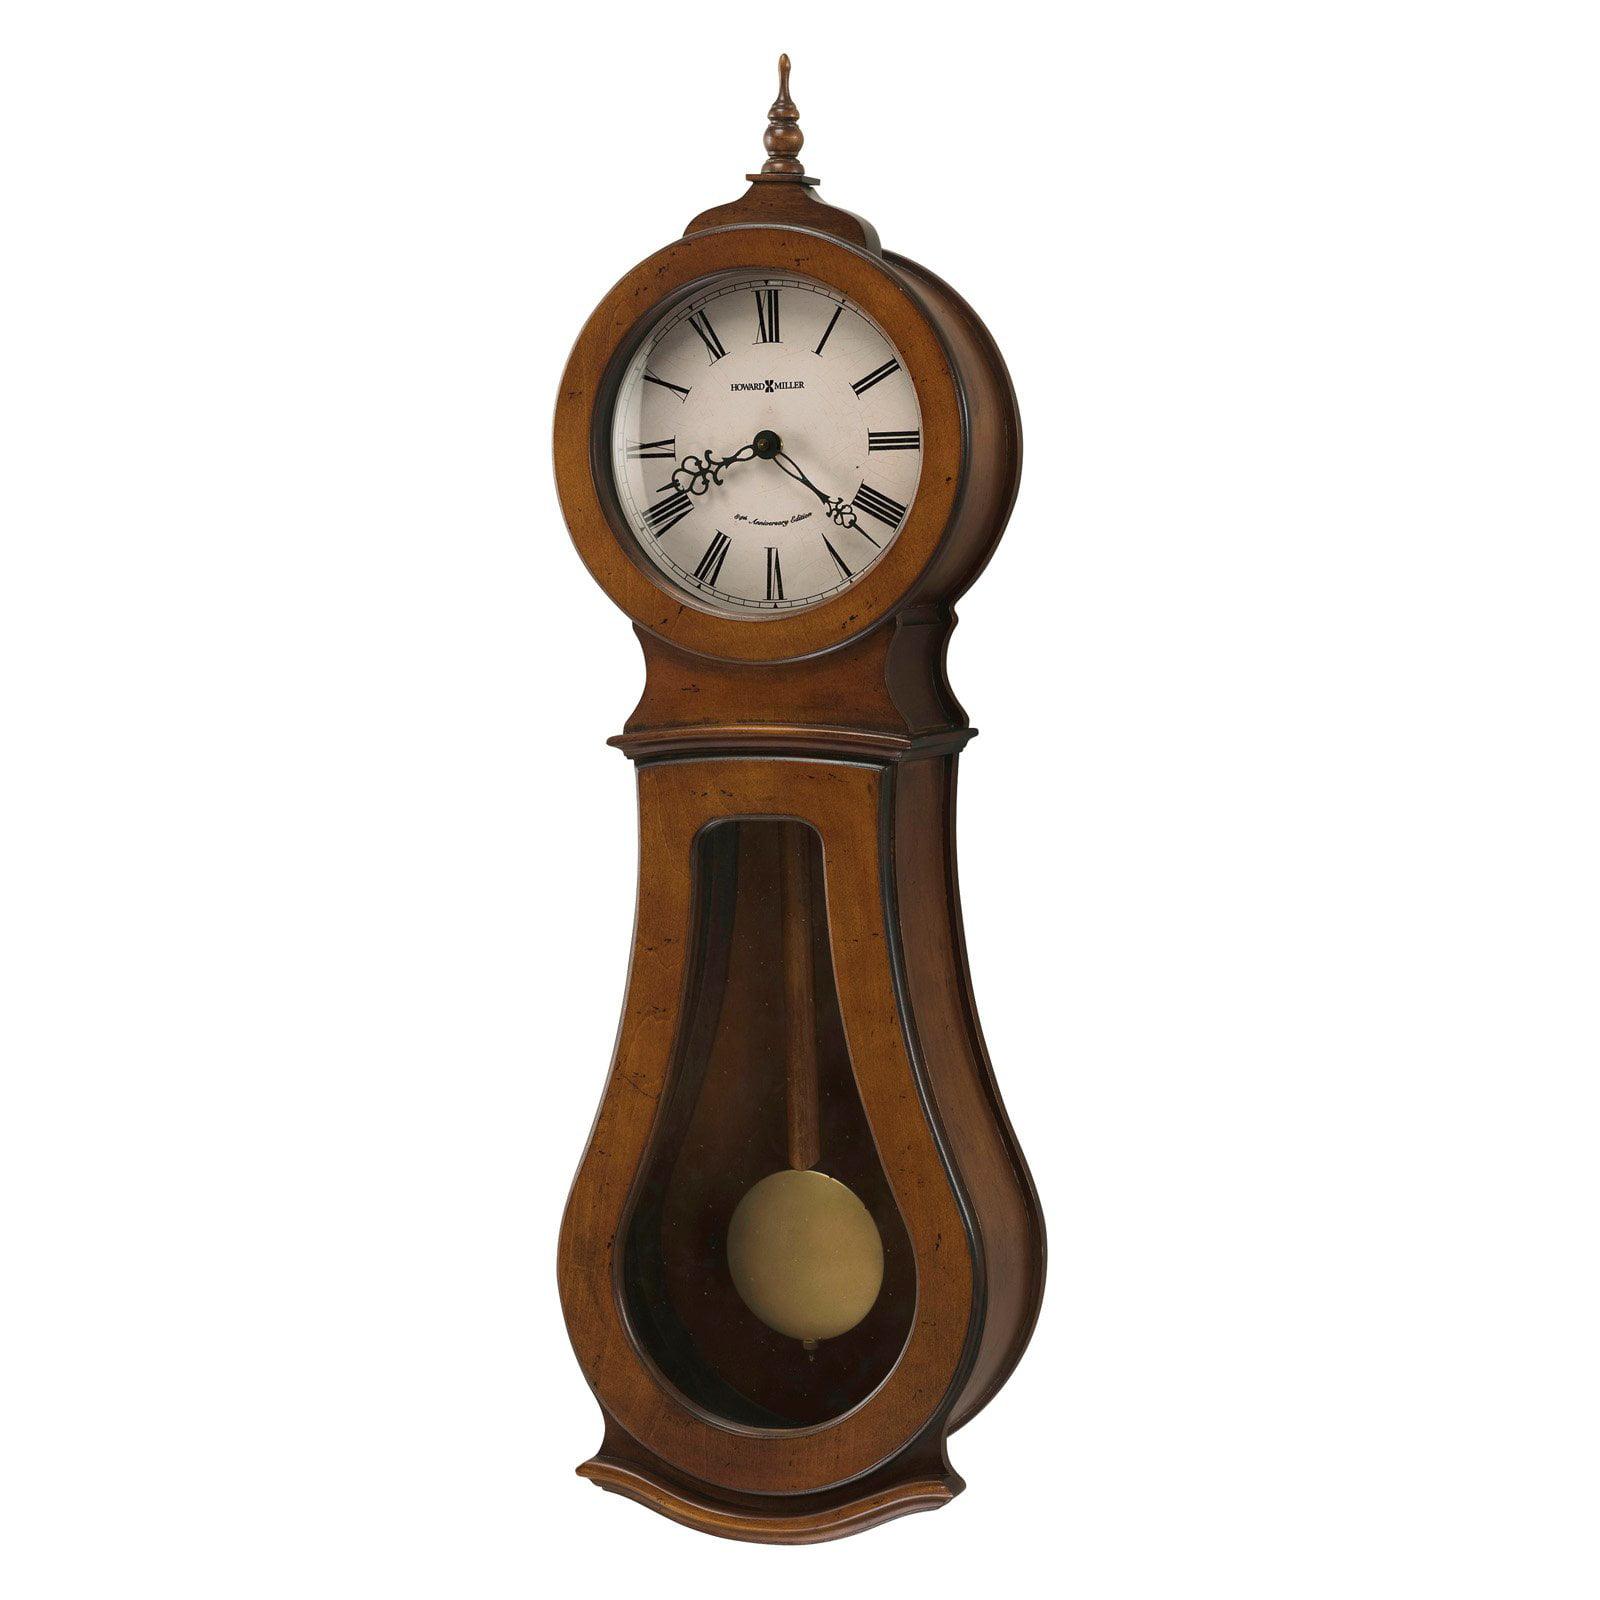 Howard Miller 625-500 Cleo Wall Clock 9-in. Wide by Howard Miller